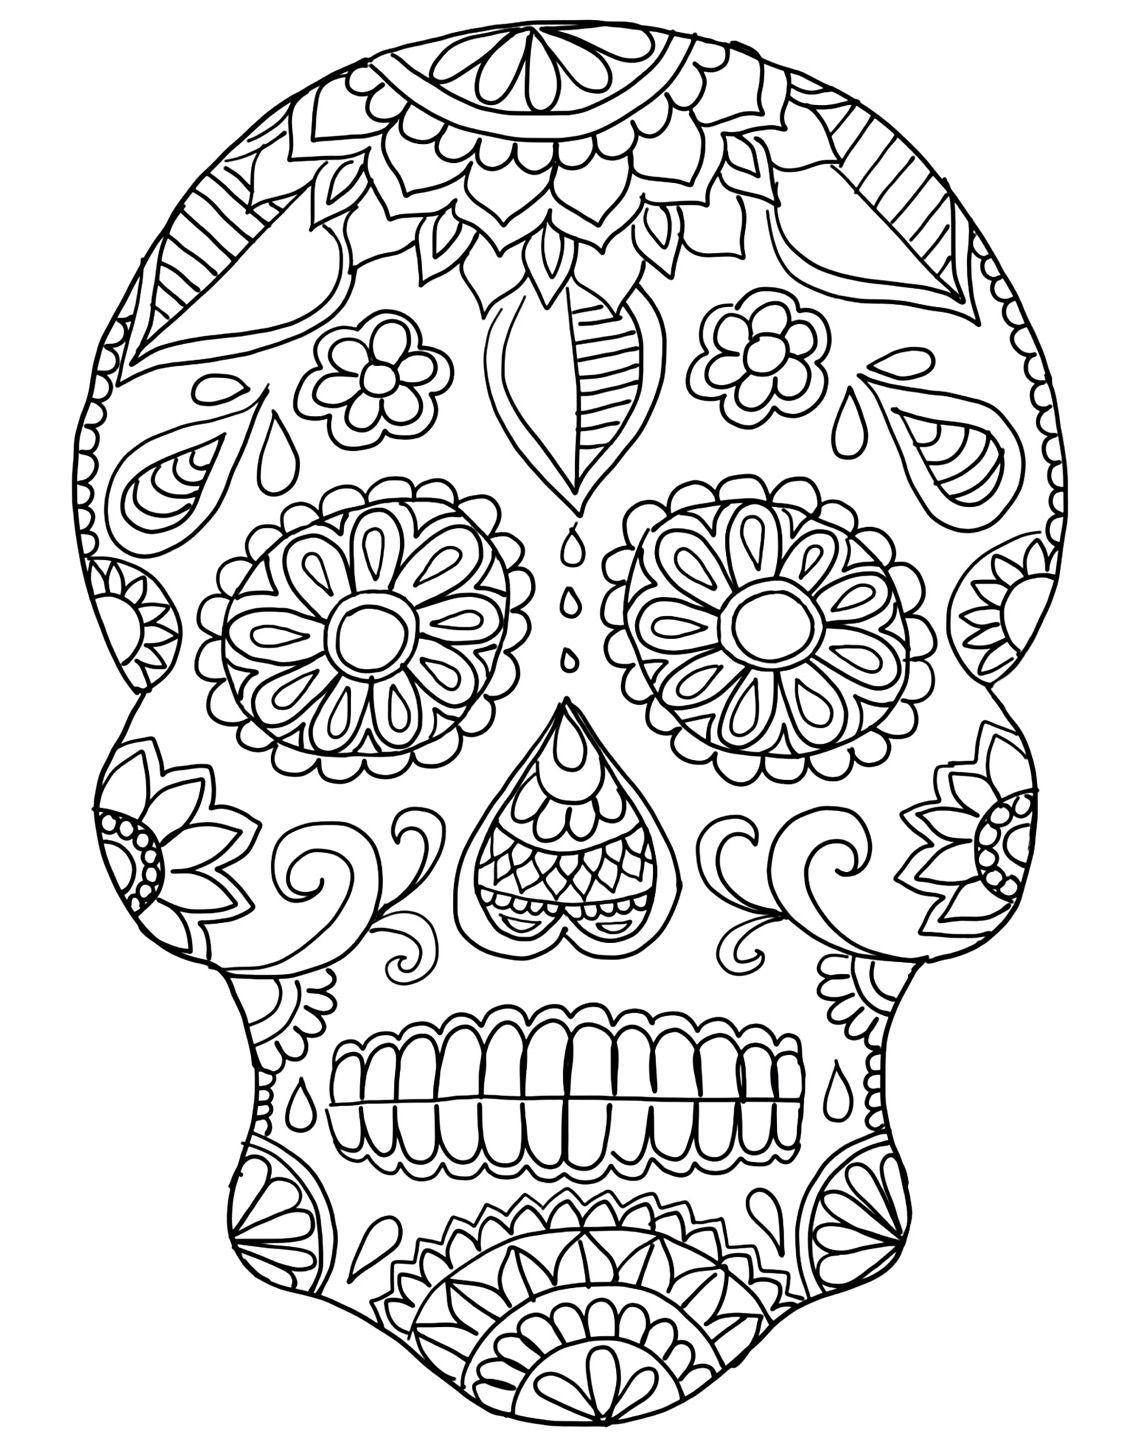 colored sugar skulls minnesota vikings logo stencil minnesota vikings colored sugar skulls